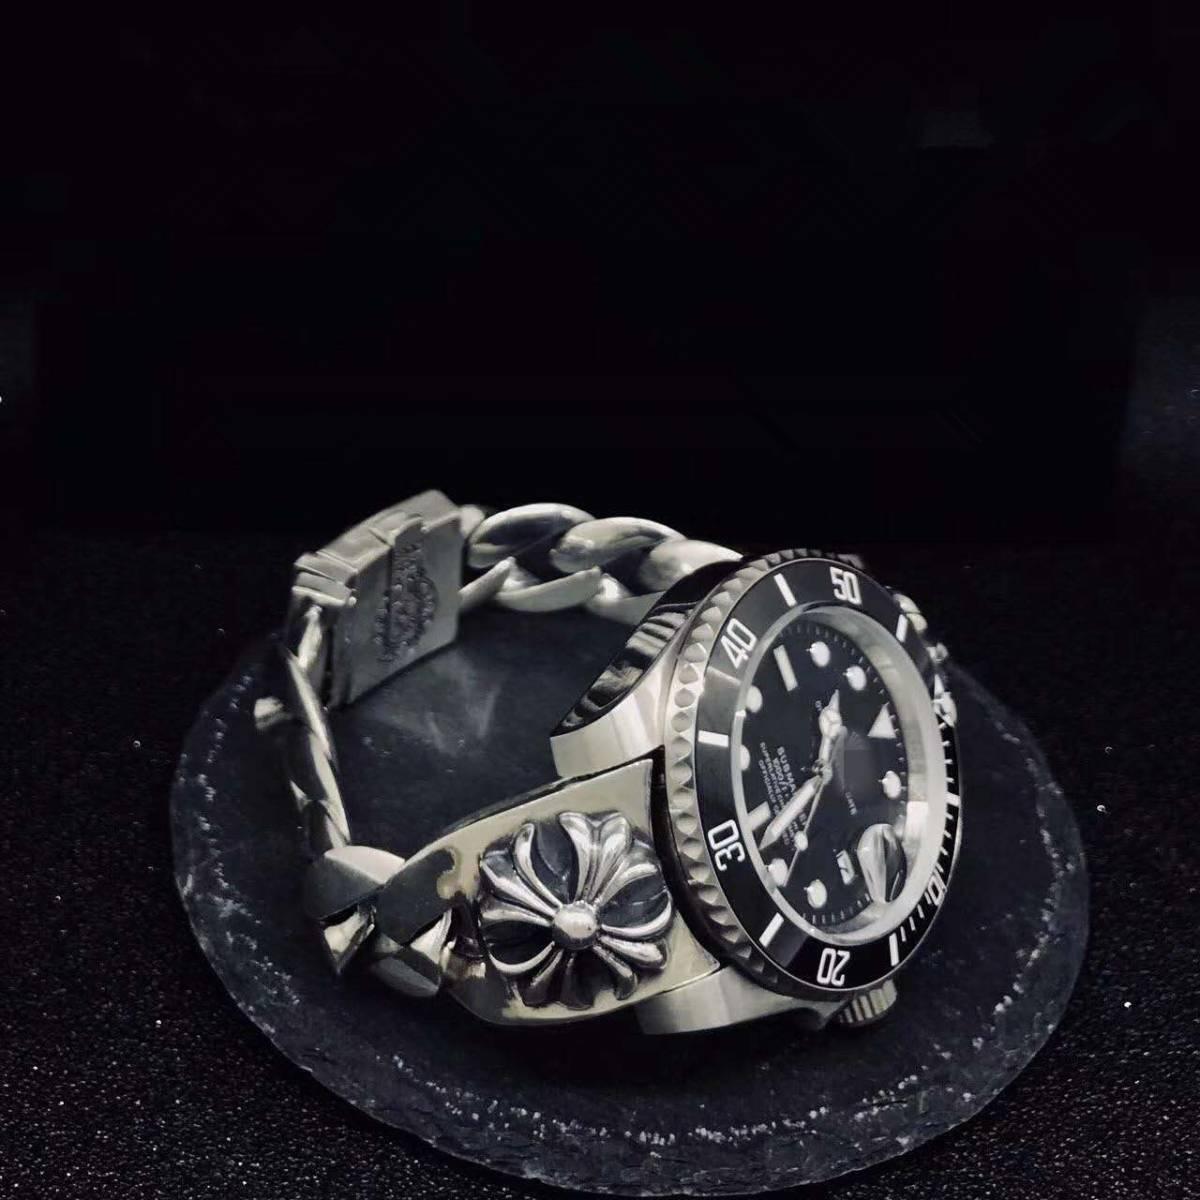 JF製 美品 自動巻き 高品質 1:1 SSS メンズ腕時計 noob製 42mm_画像3